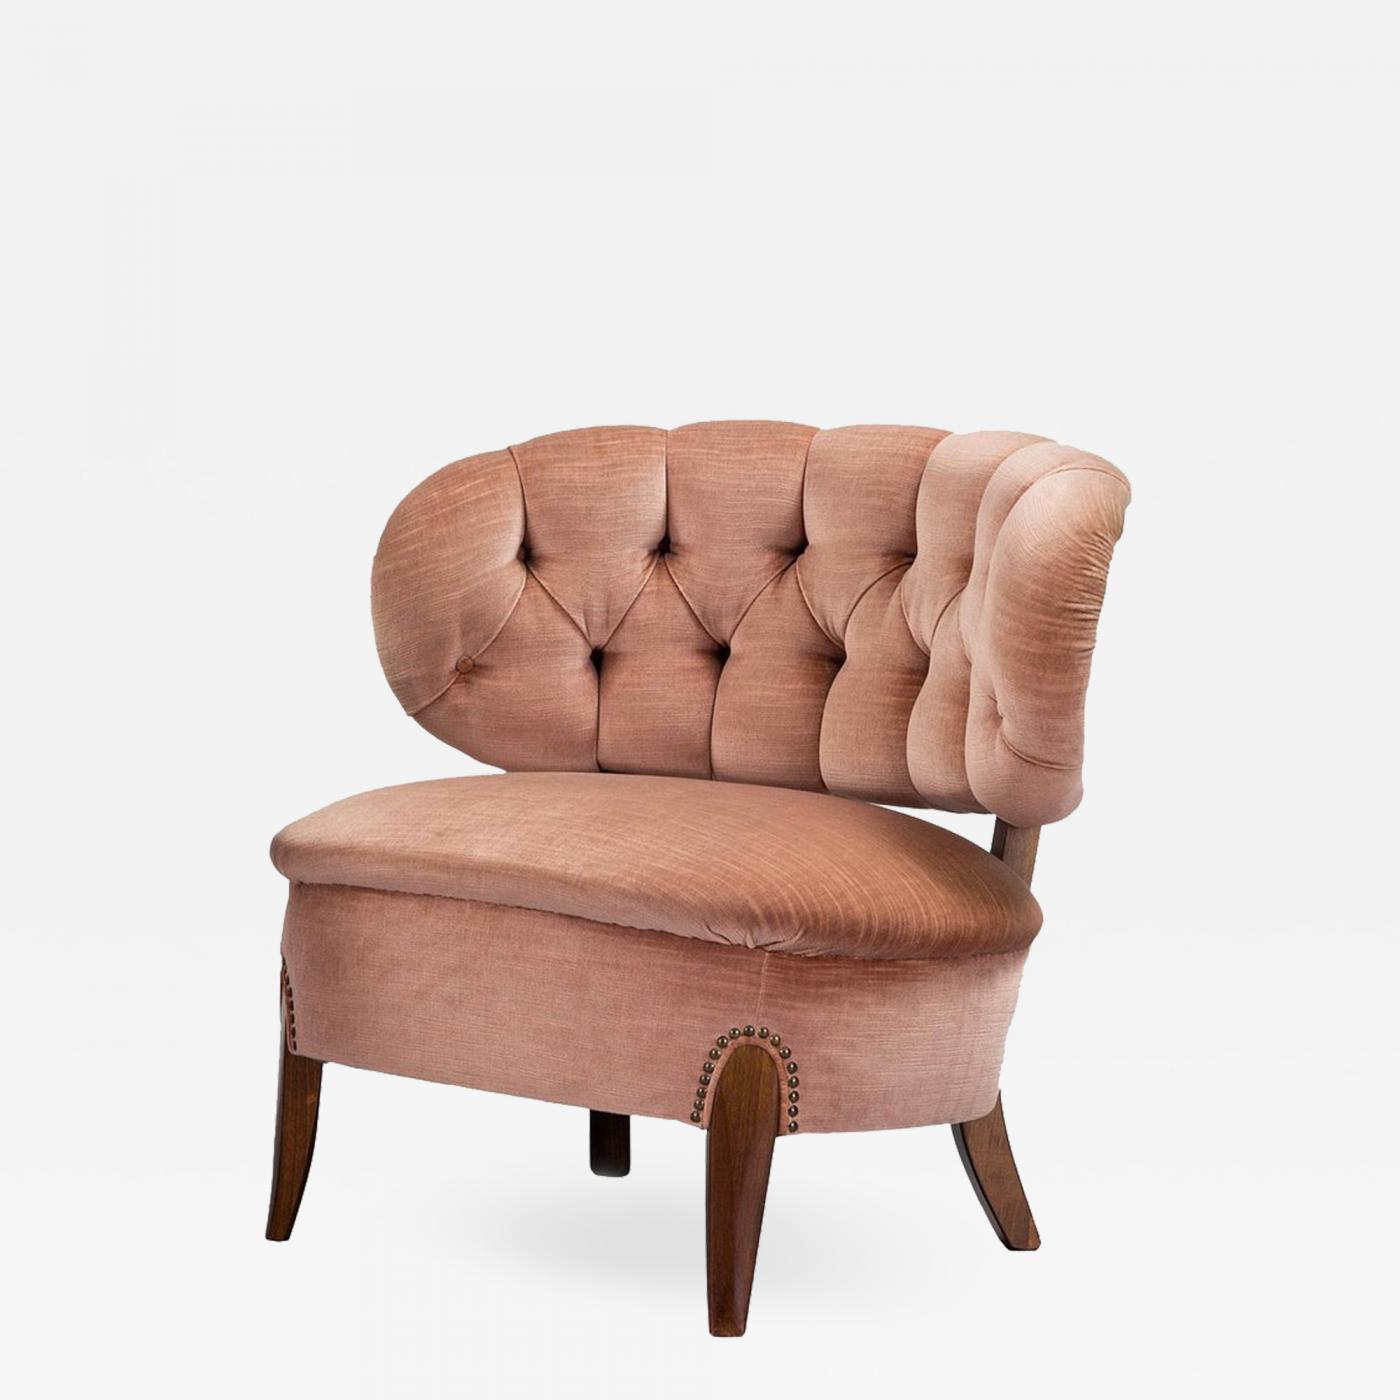 Brilliant Otto Schulz Mid Century Modern Pink Velvet Easy Chair By Otto Schulz 1950S Dailytribune Chair Design For Home Dailytribuneorg